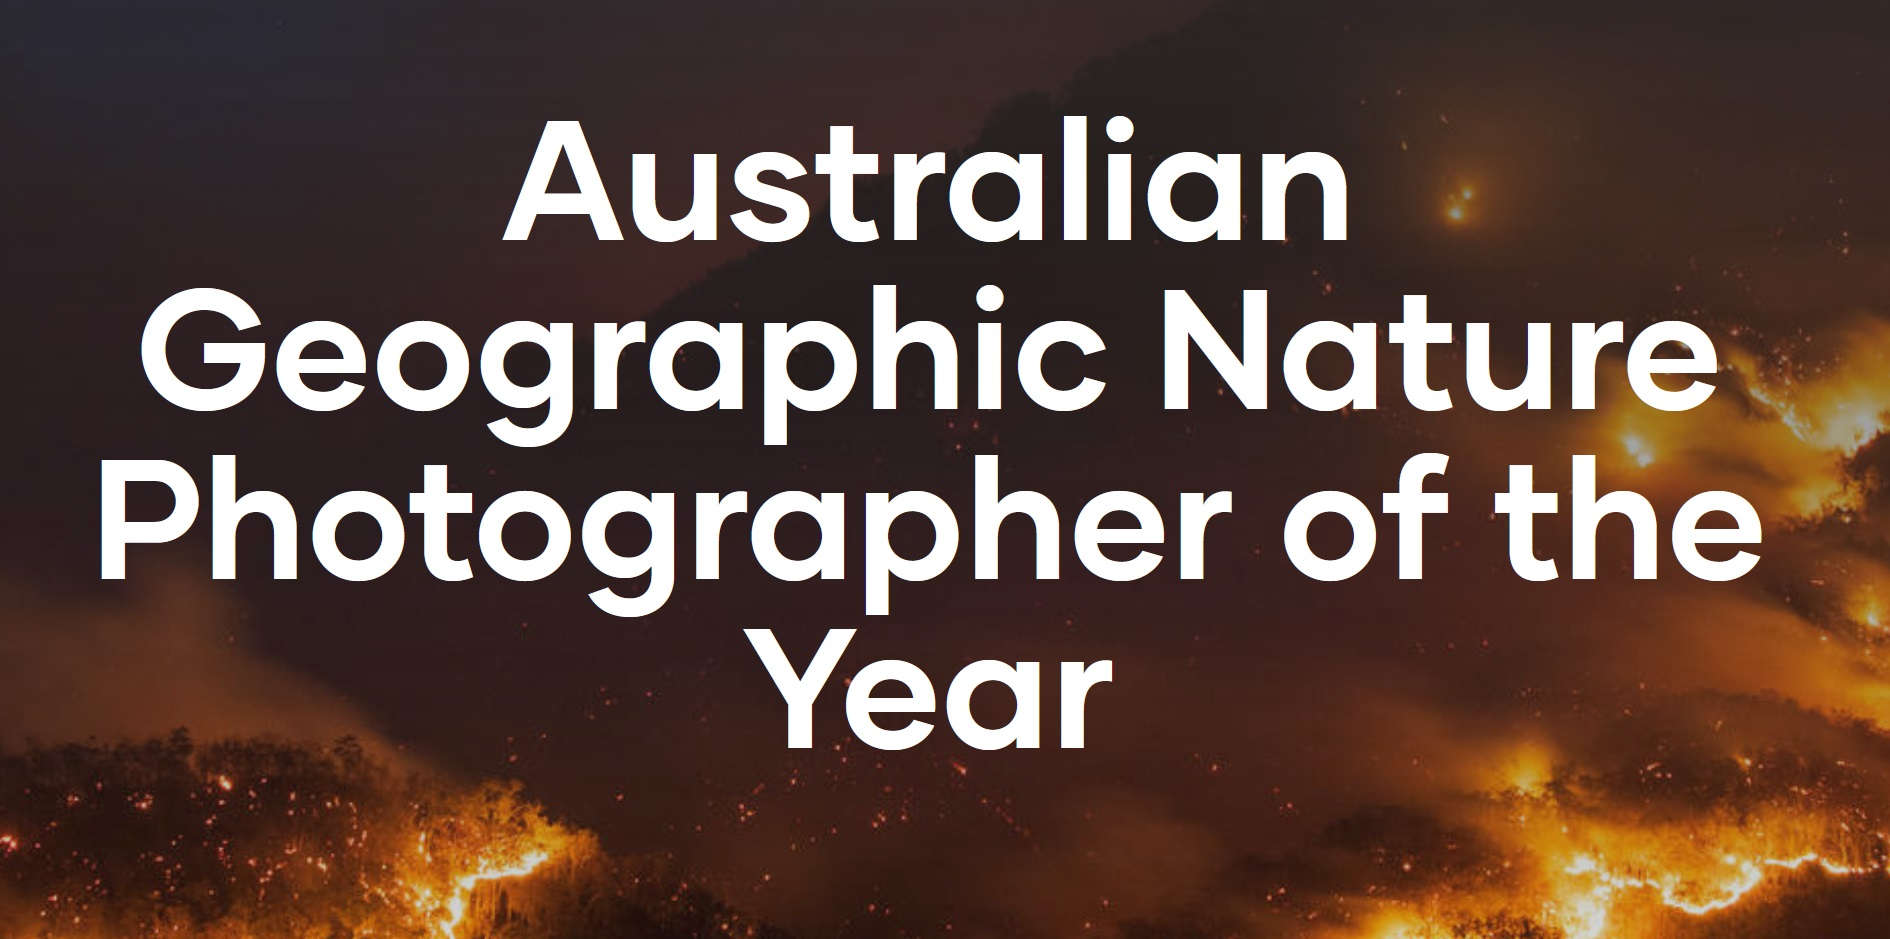 Australian Geographic Nature Photographer of the Year 2021 - logo